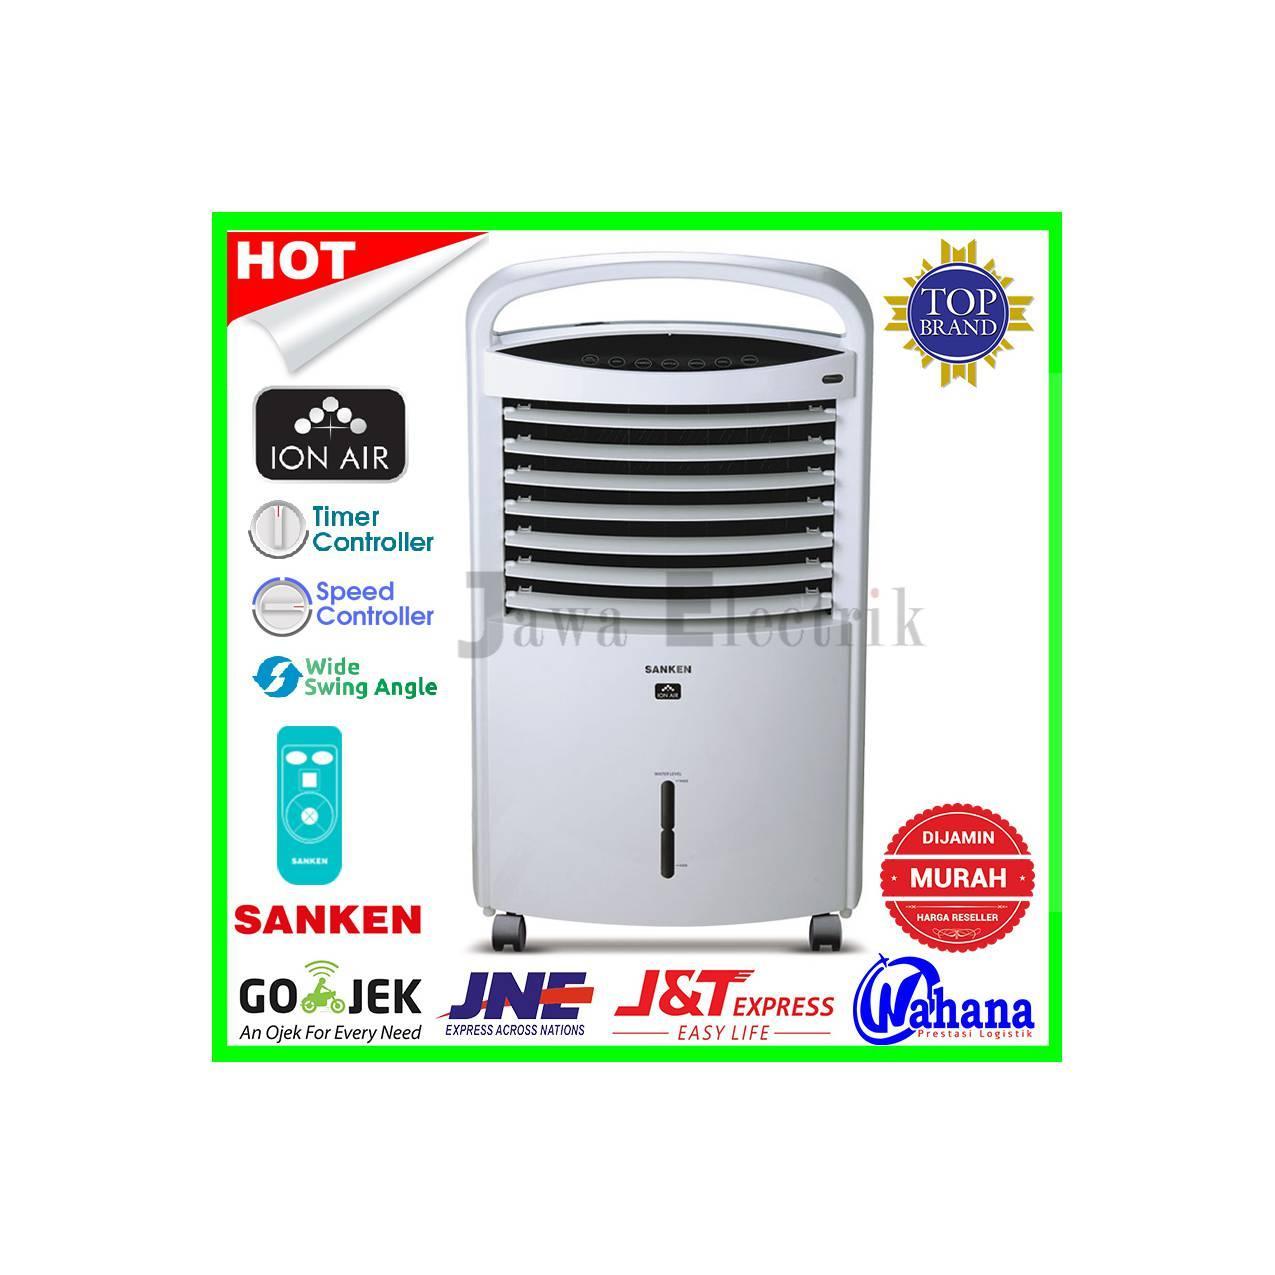 Sanyo Air Cooler Refb110 White Khusus Jabodetabek Daftar Harga Ref B130 Sanken Sac 55 Dengan Fitur Multi Fungsi Kipas Humidifier